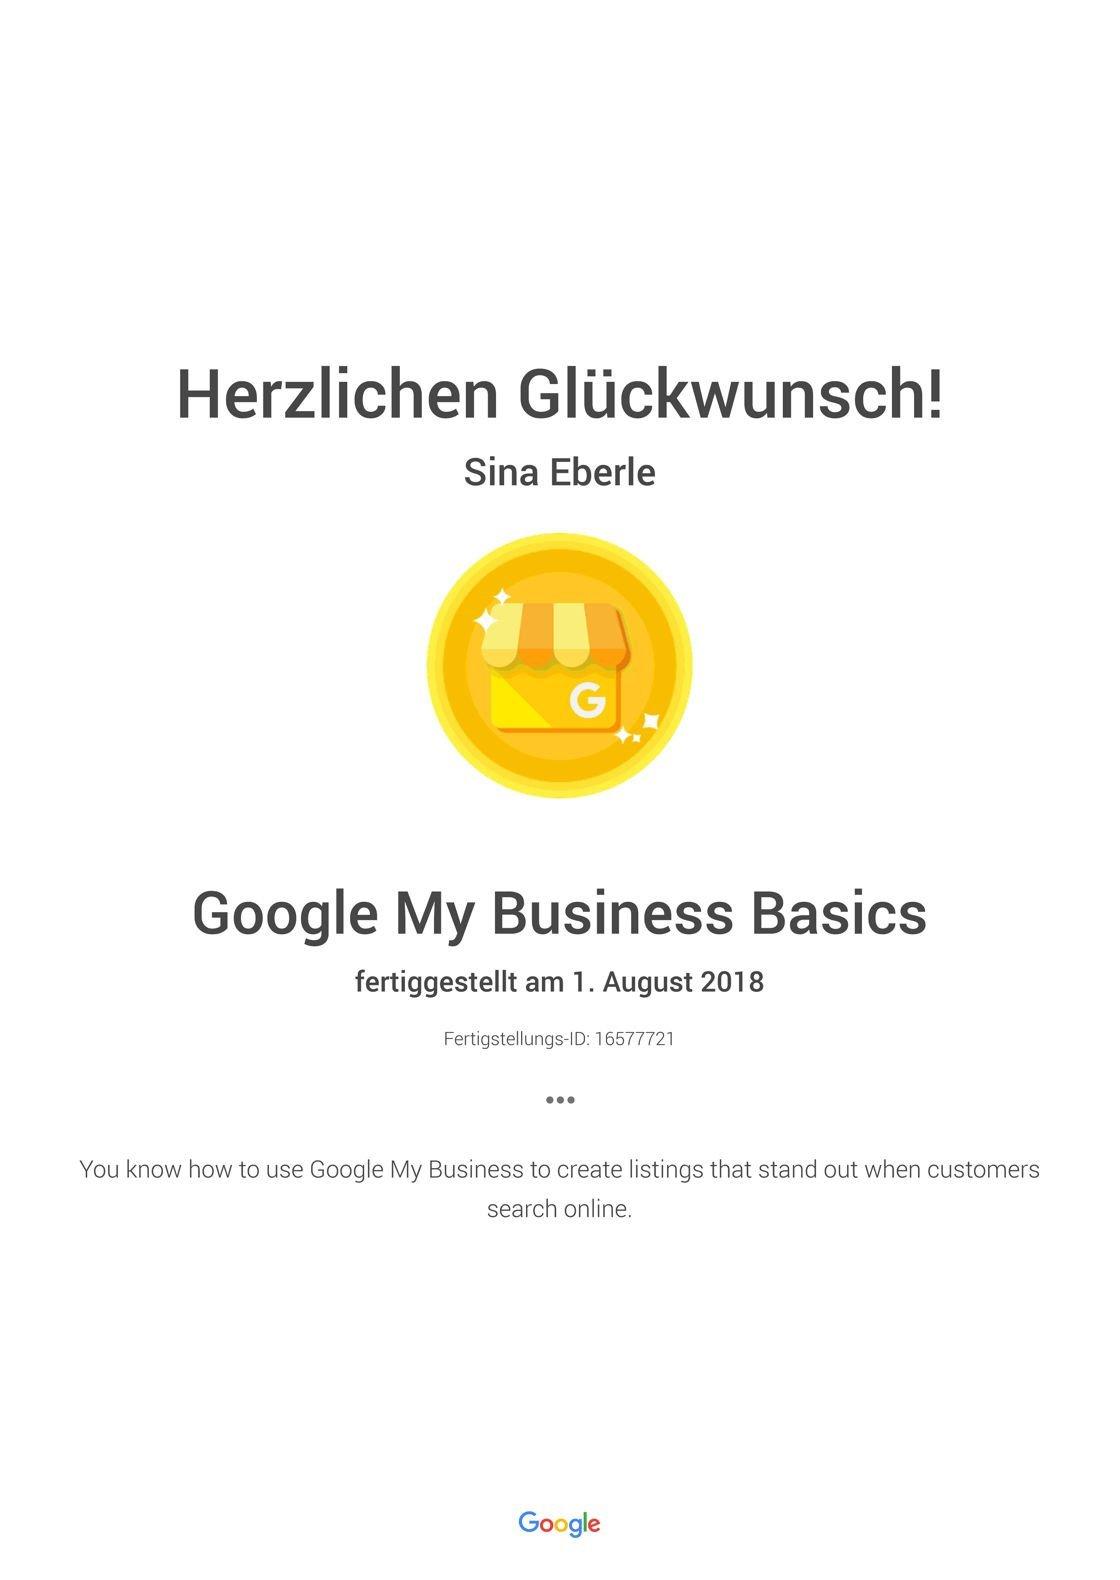 Google My Business Basics- Academy for Ads